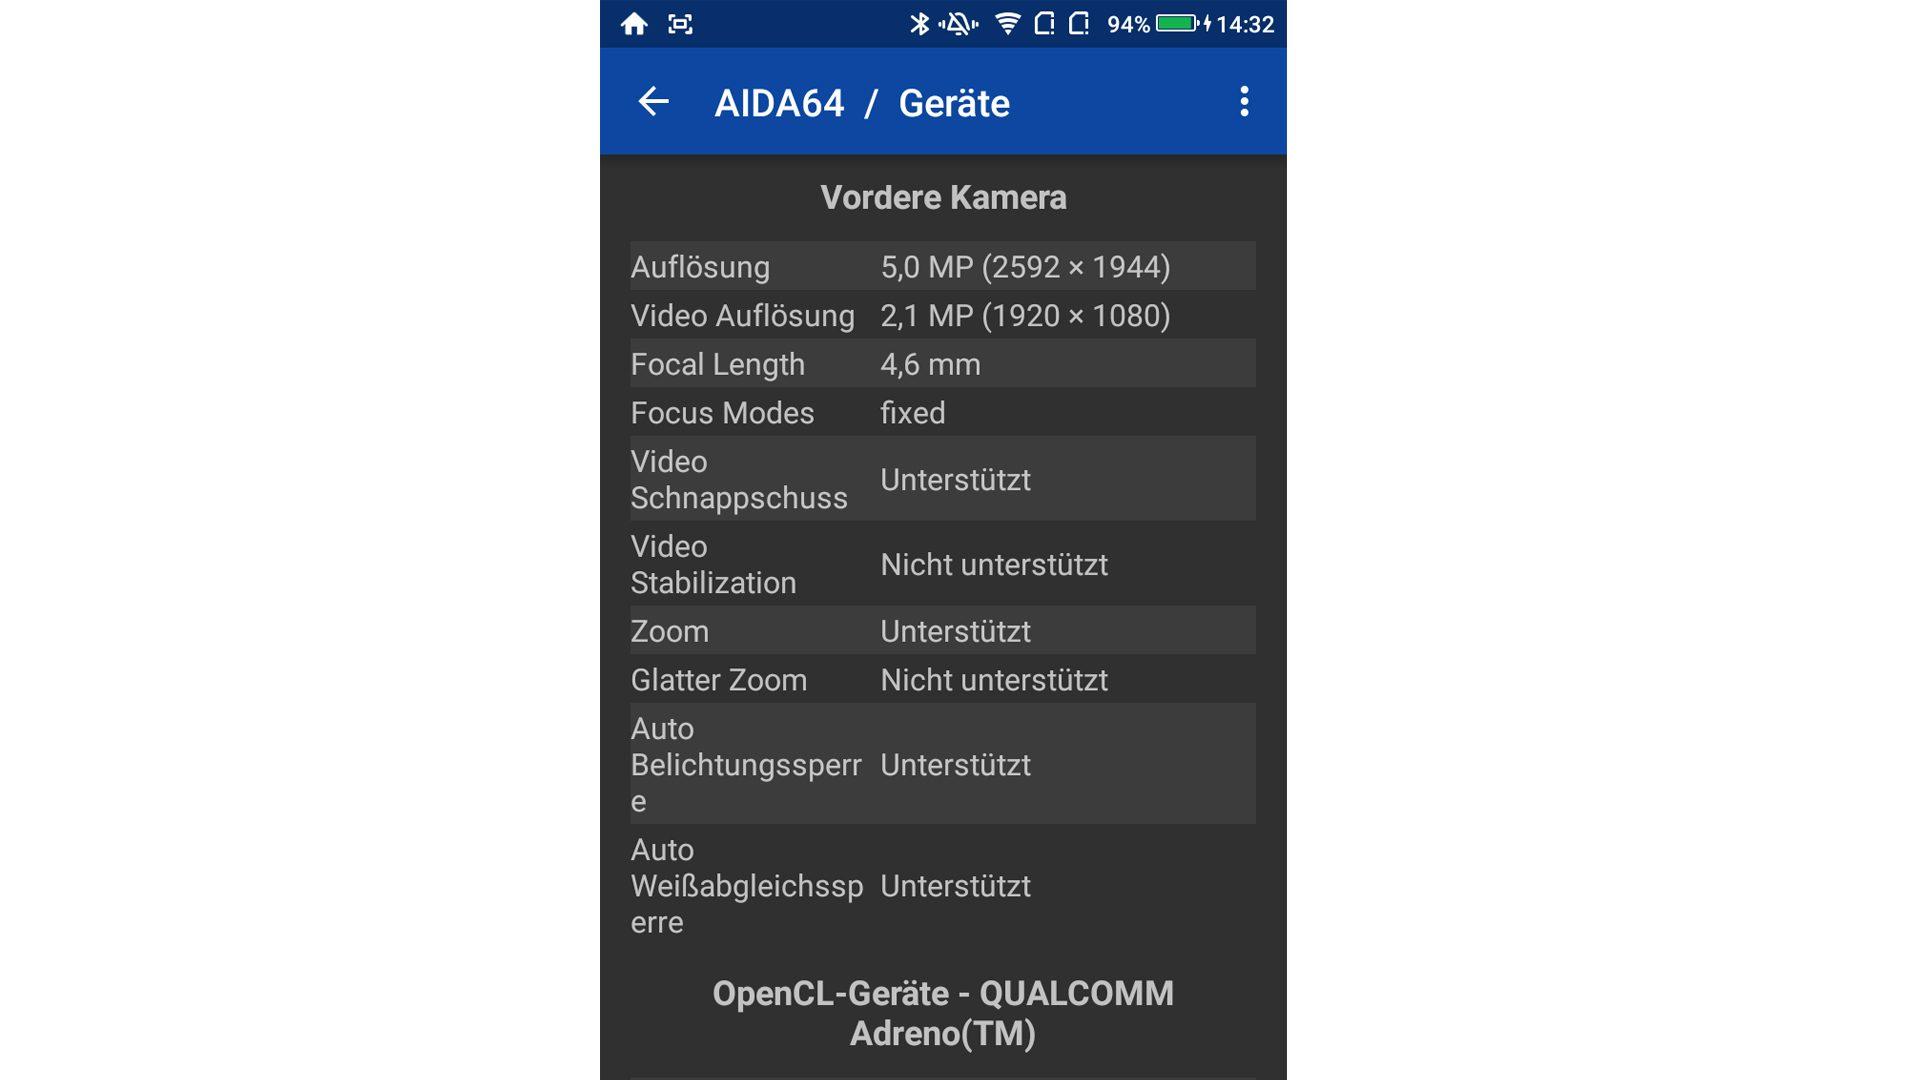 Coolpad-Torino-AIDA64-Kamera2